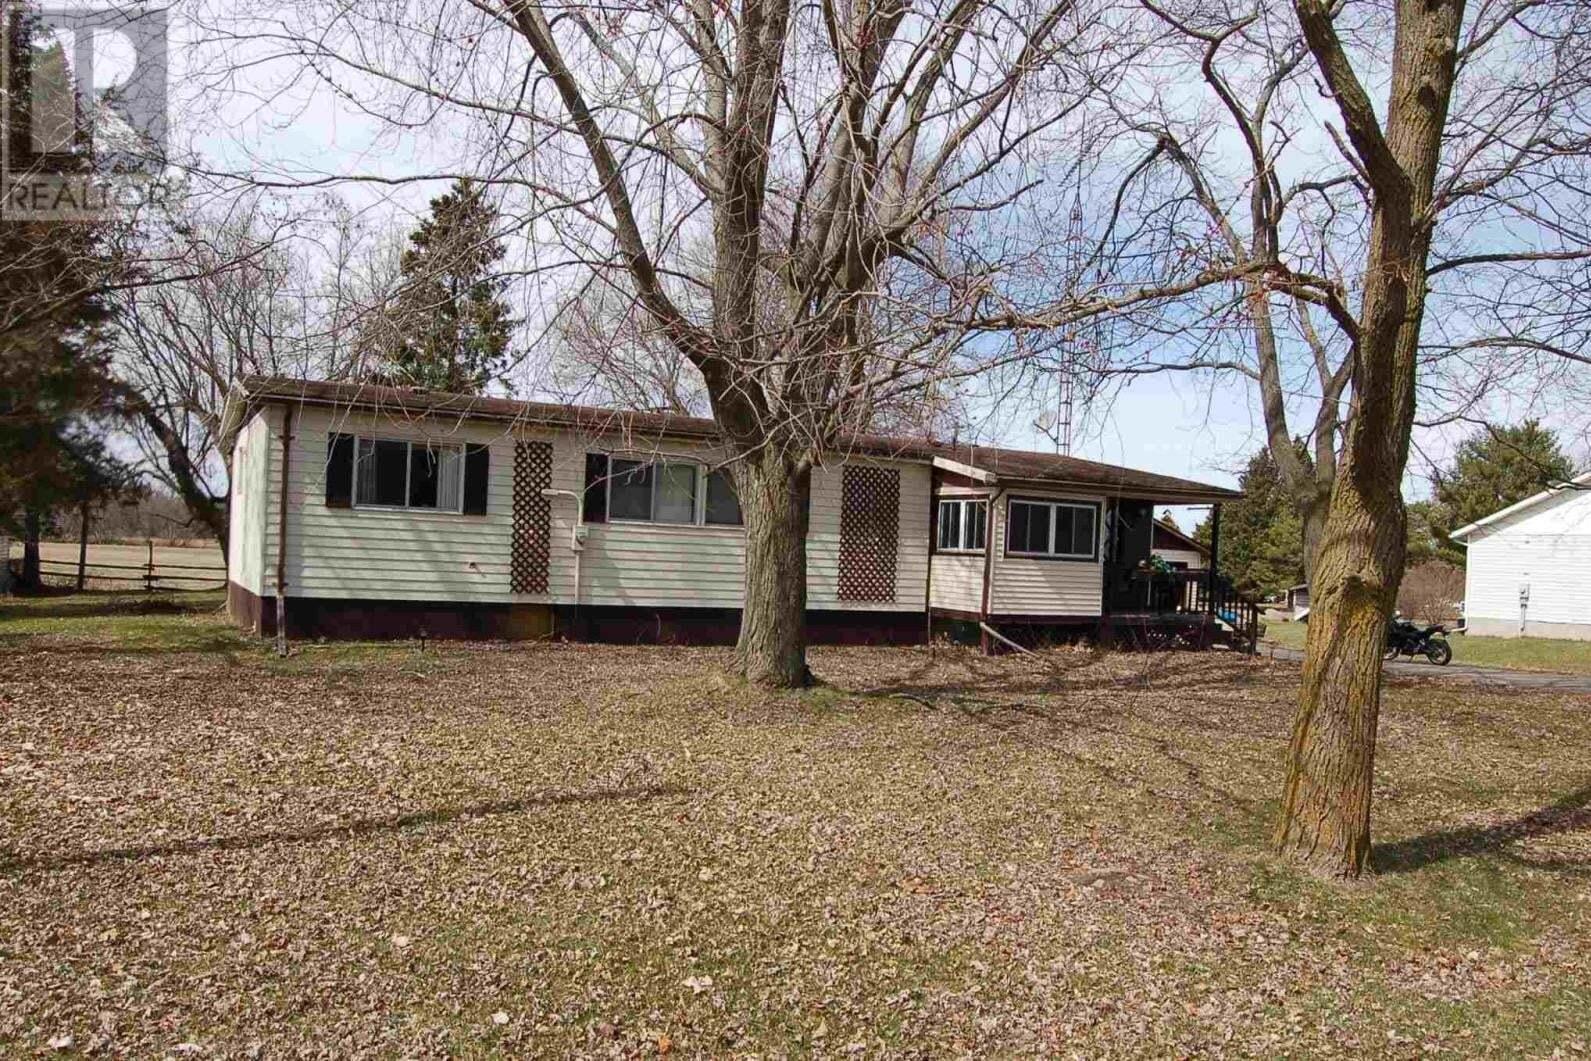 House for sale at 246 Main St Elgin Ontario - MLS: K20001908